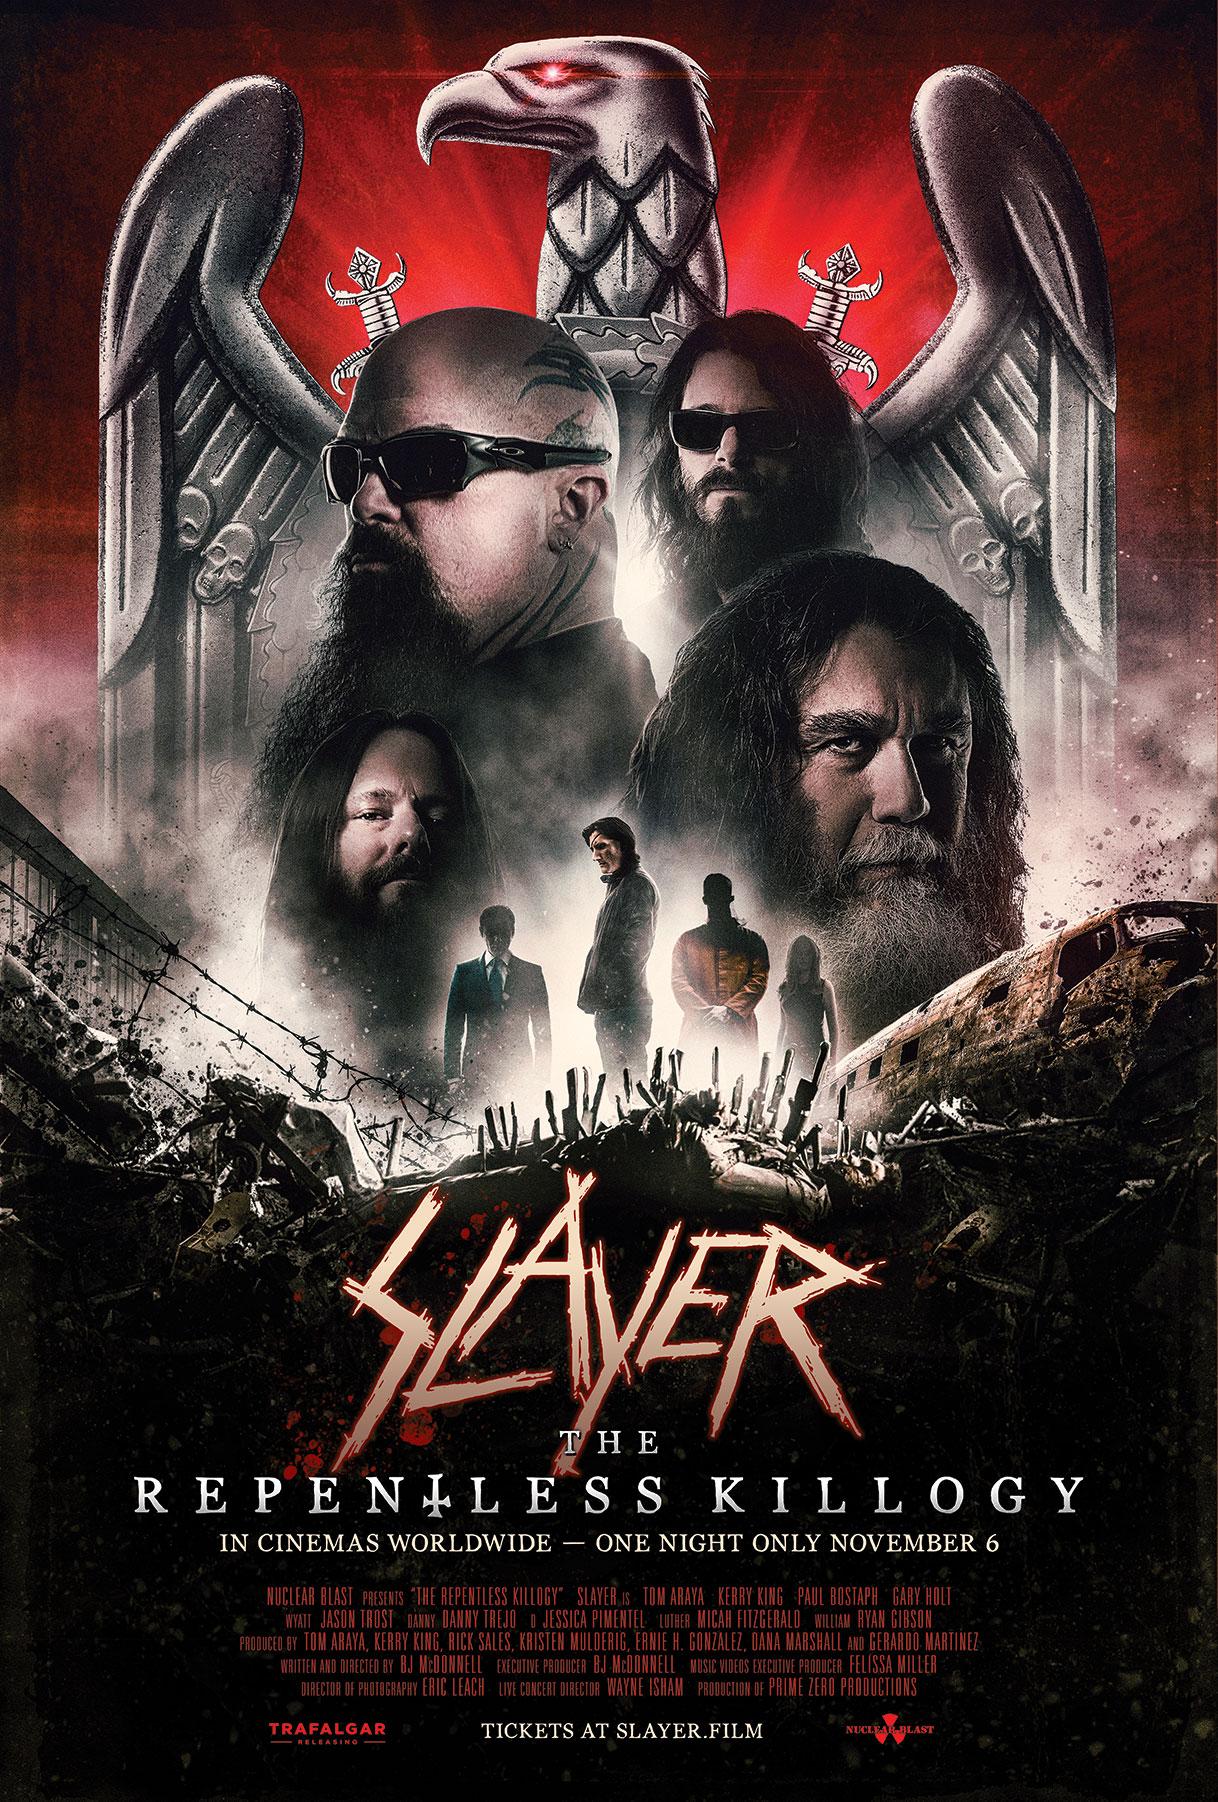 Poster for Slayer: The Repentless Killogy